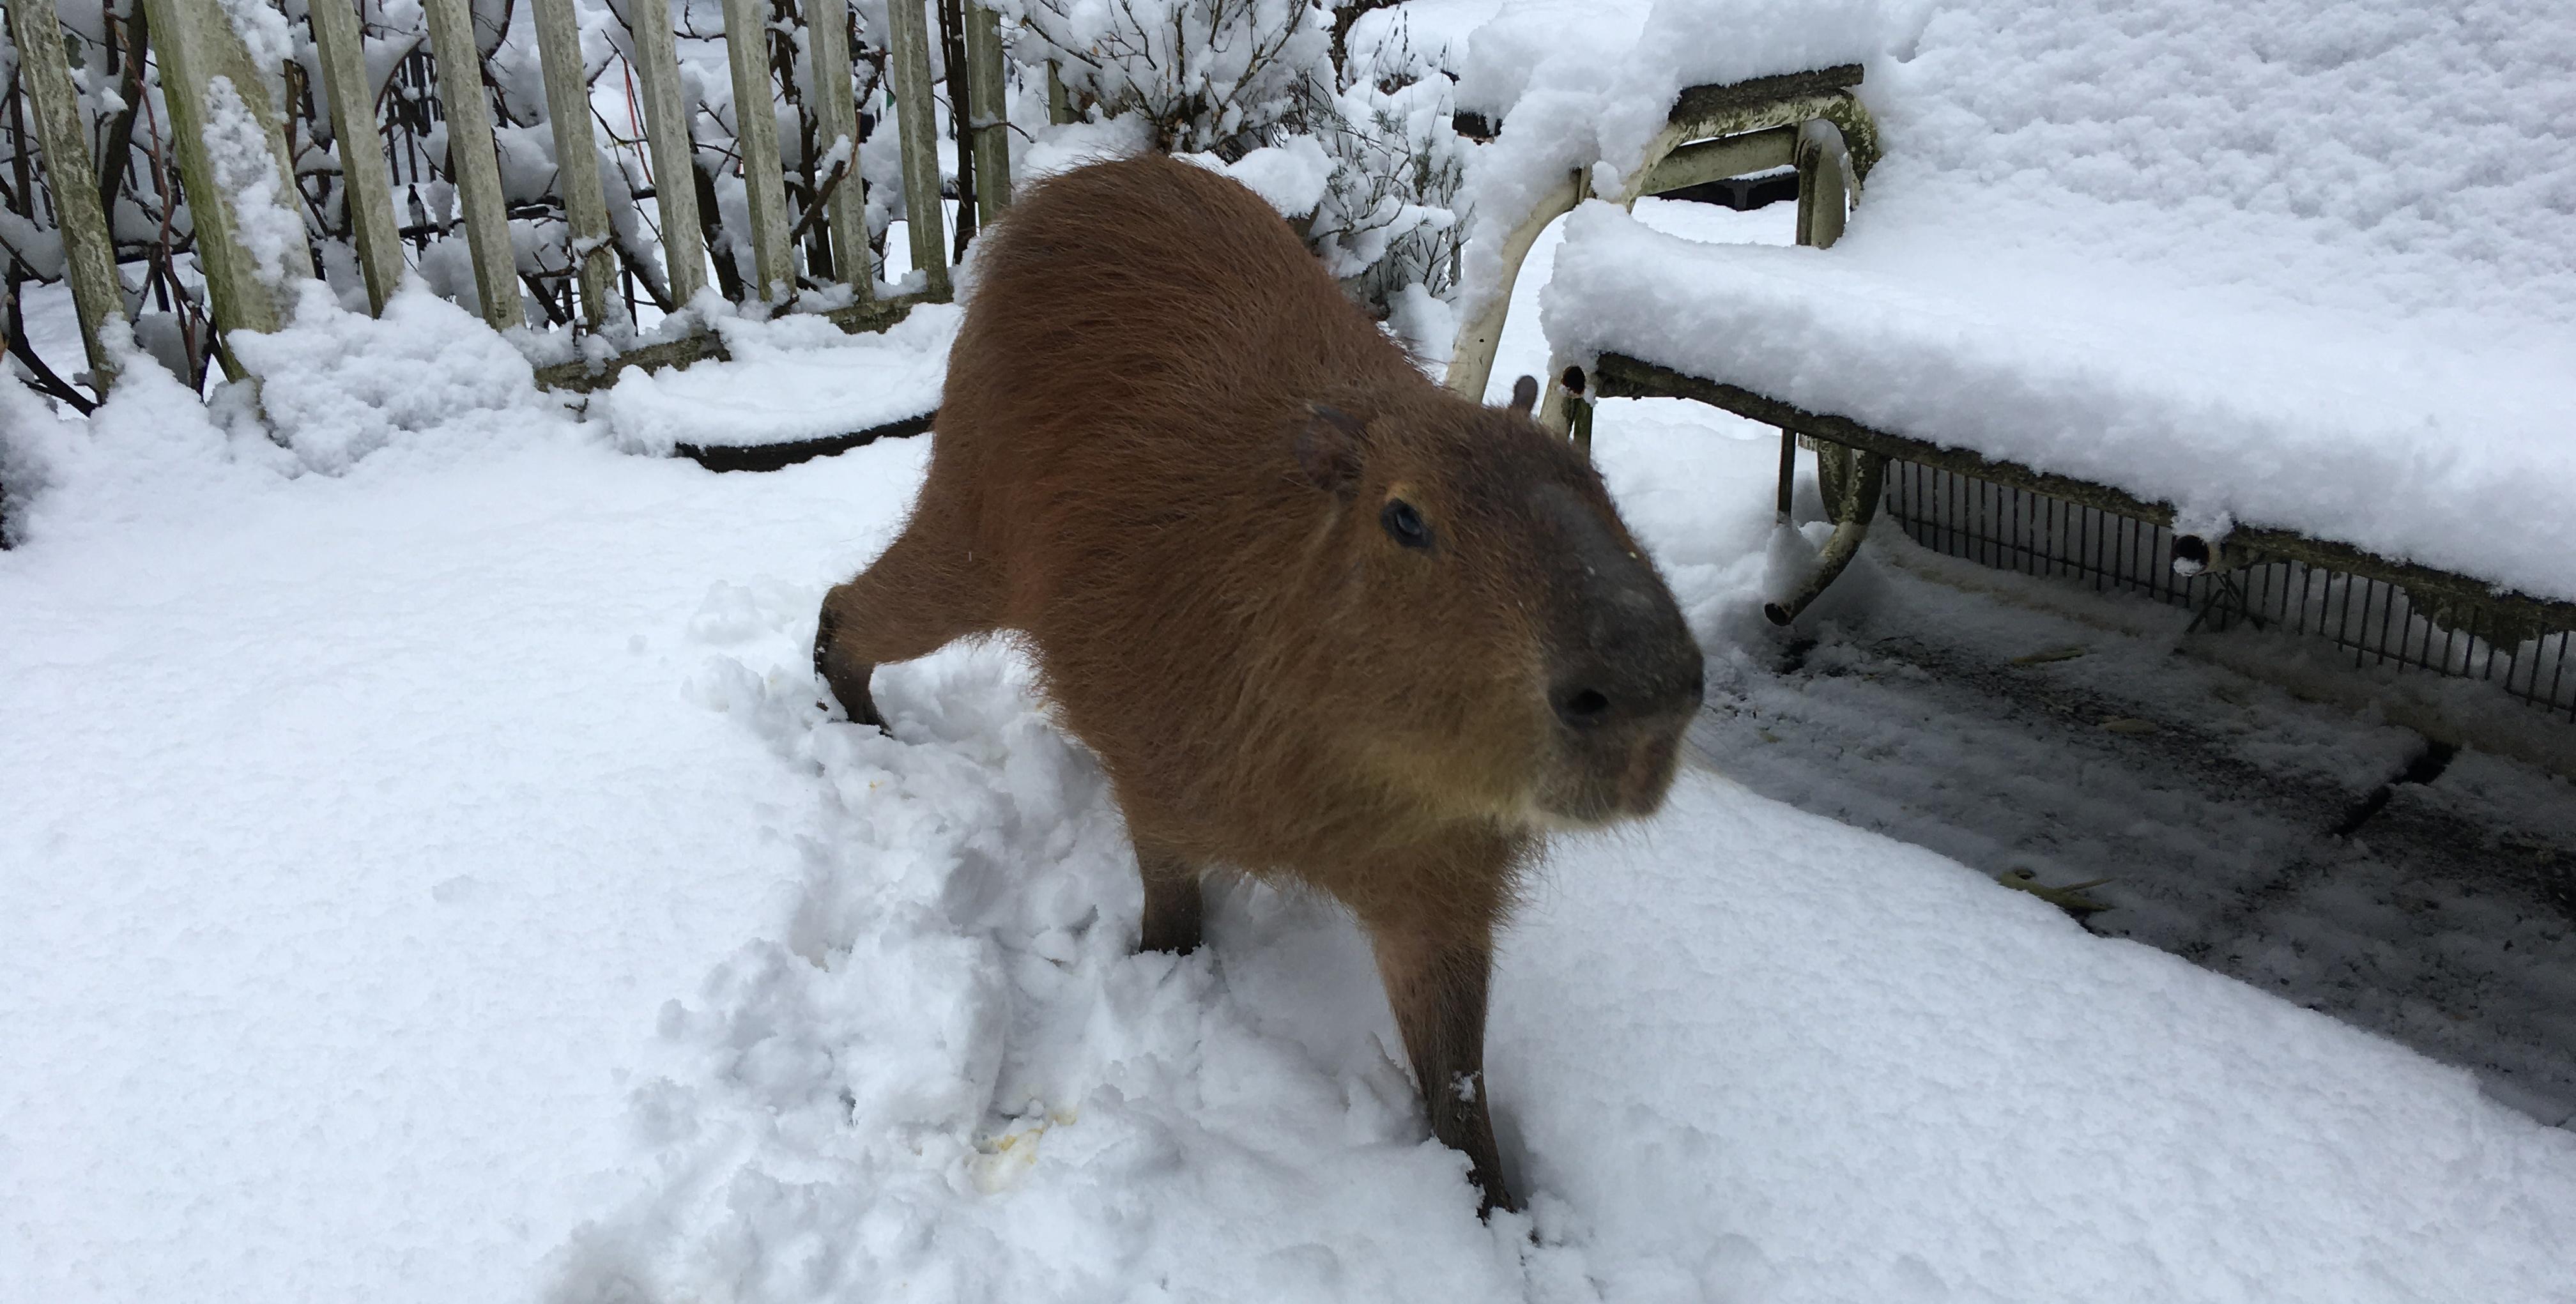 Capybaras Don't Like Snow